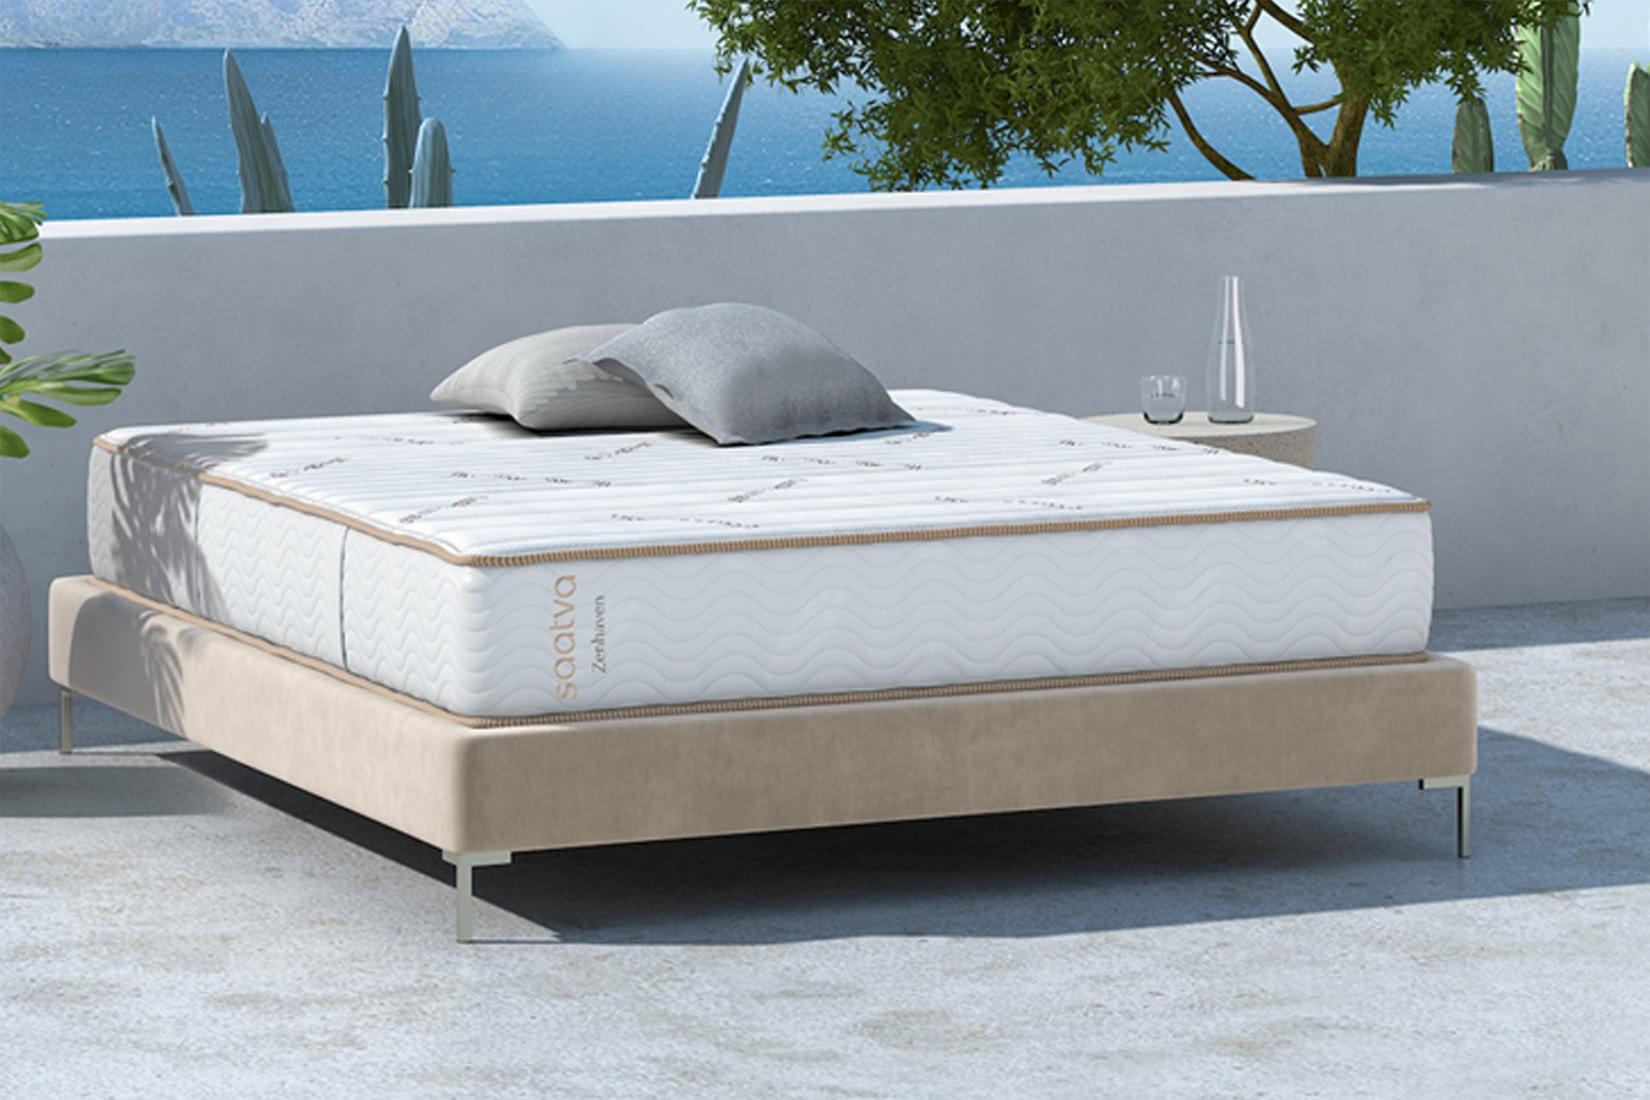 Zenhavean luxury mattress review - Luxe Digital